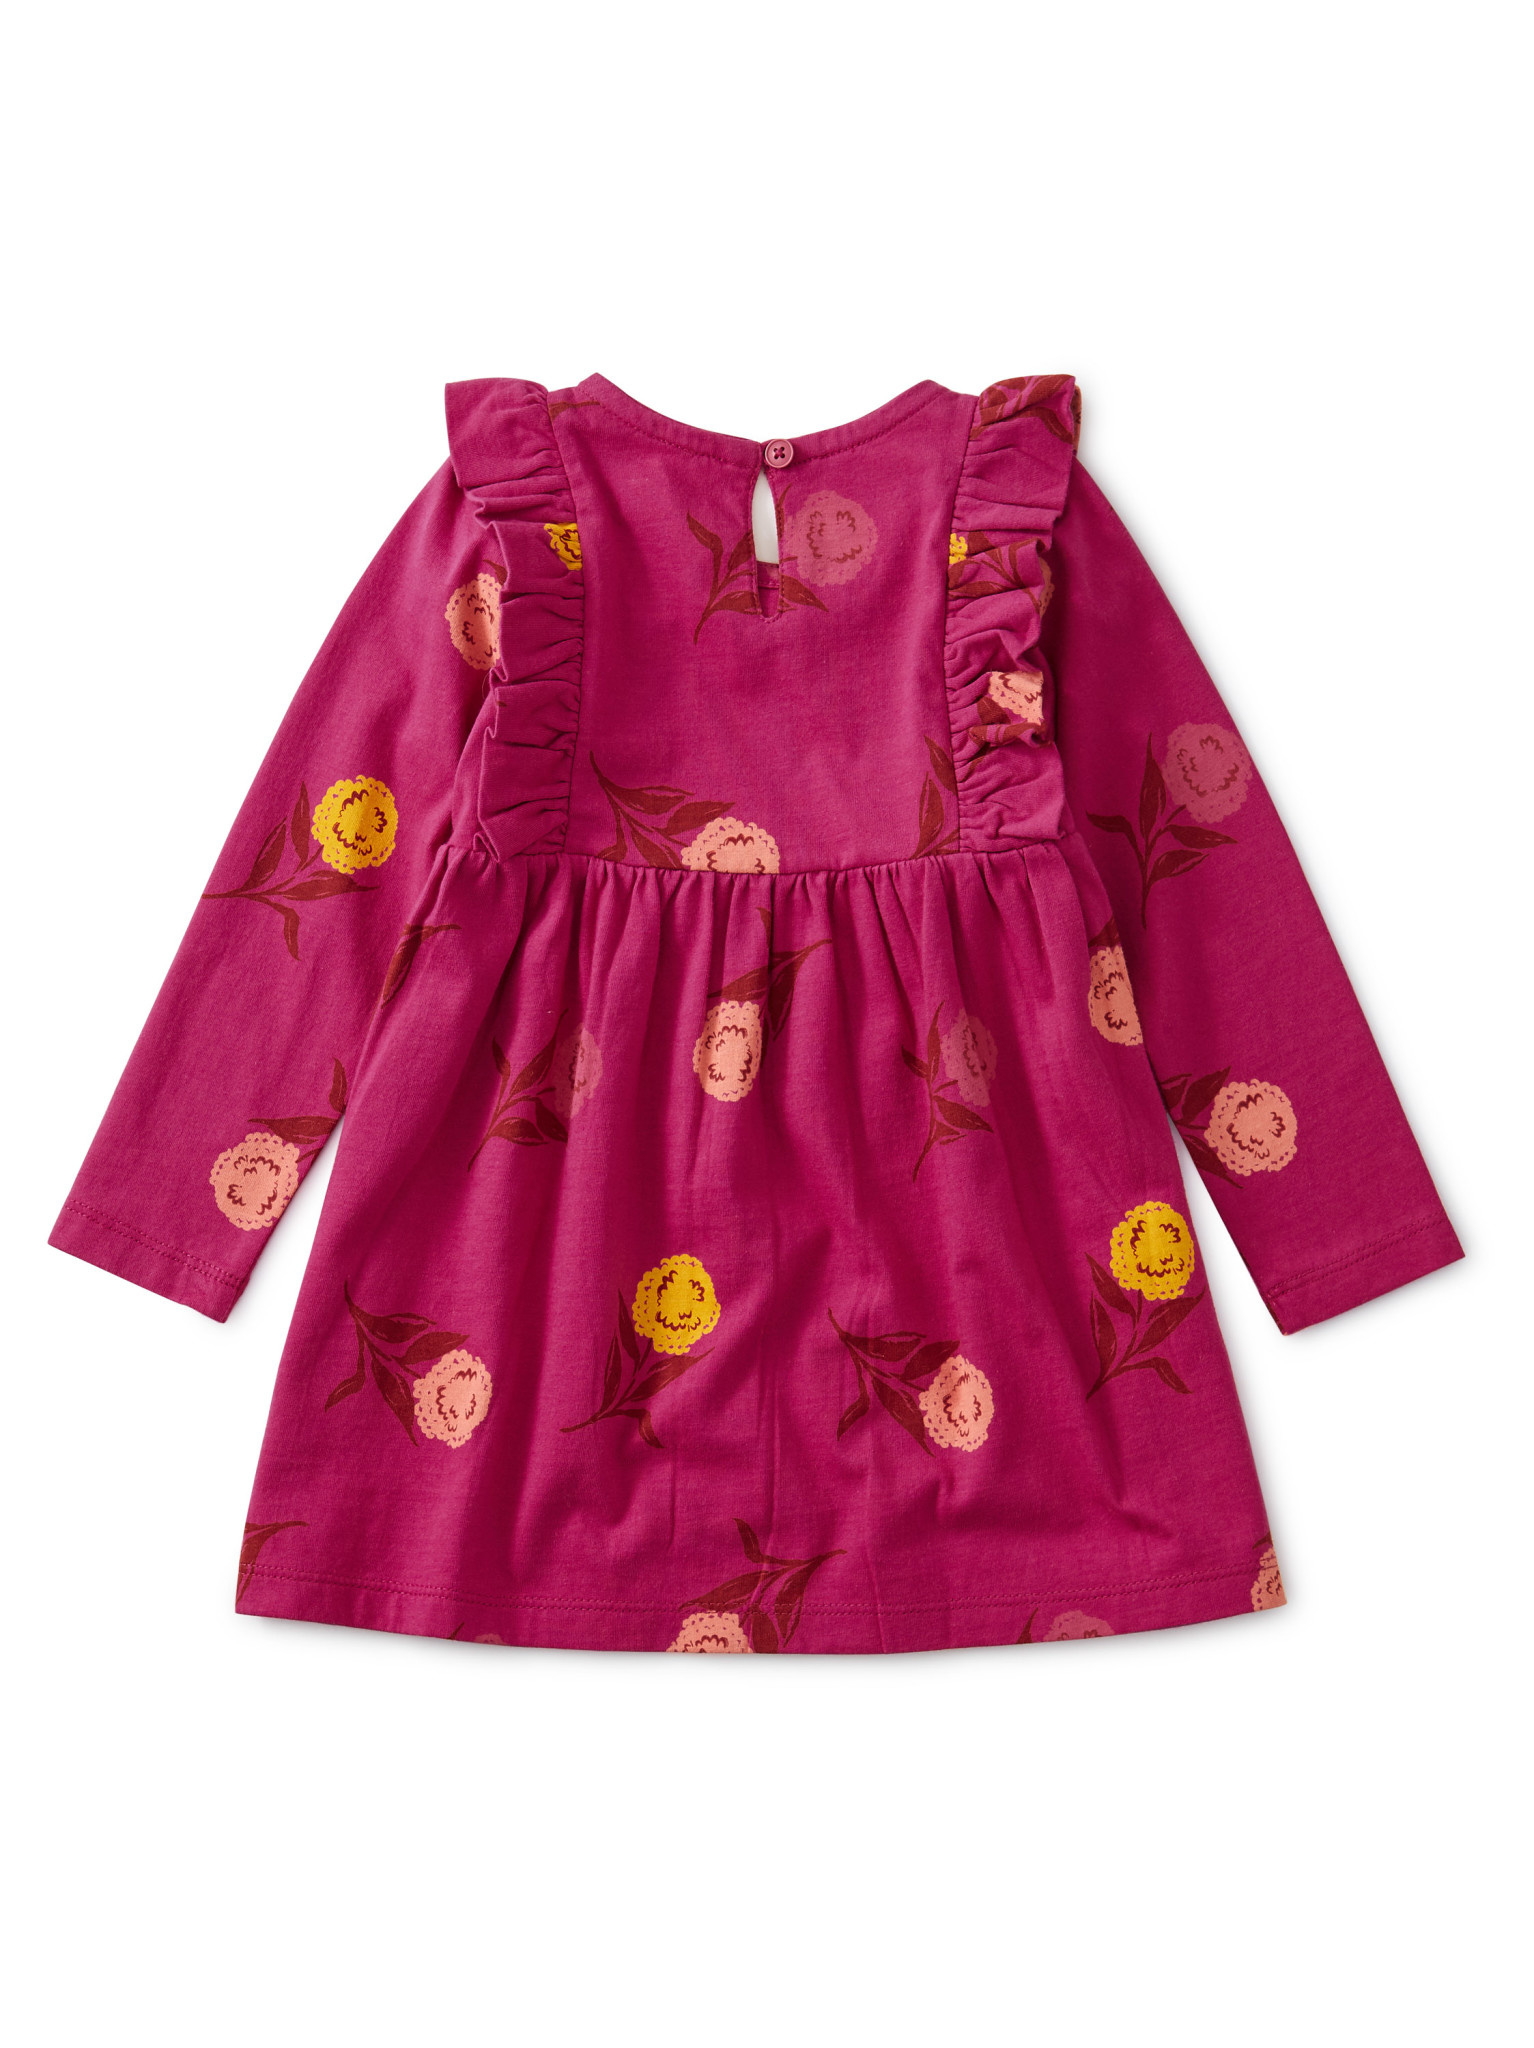 Tea Collection Festival Ruffle Baby Dress